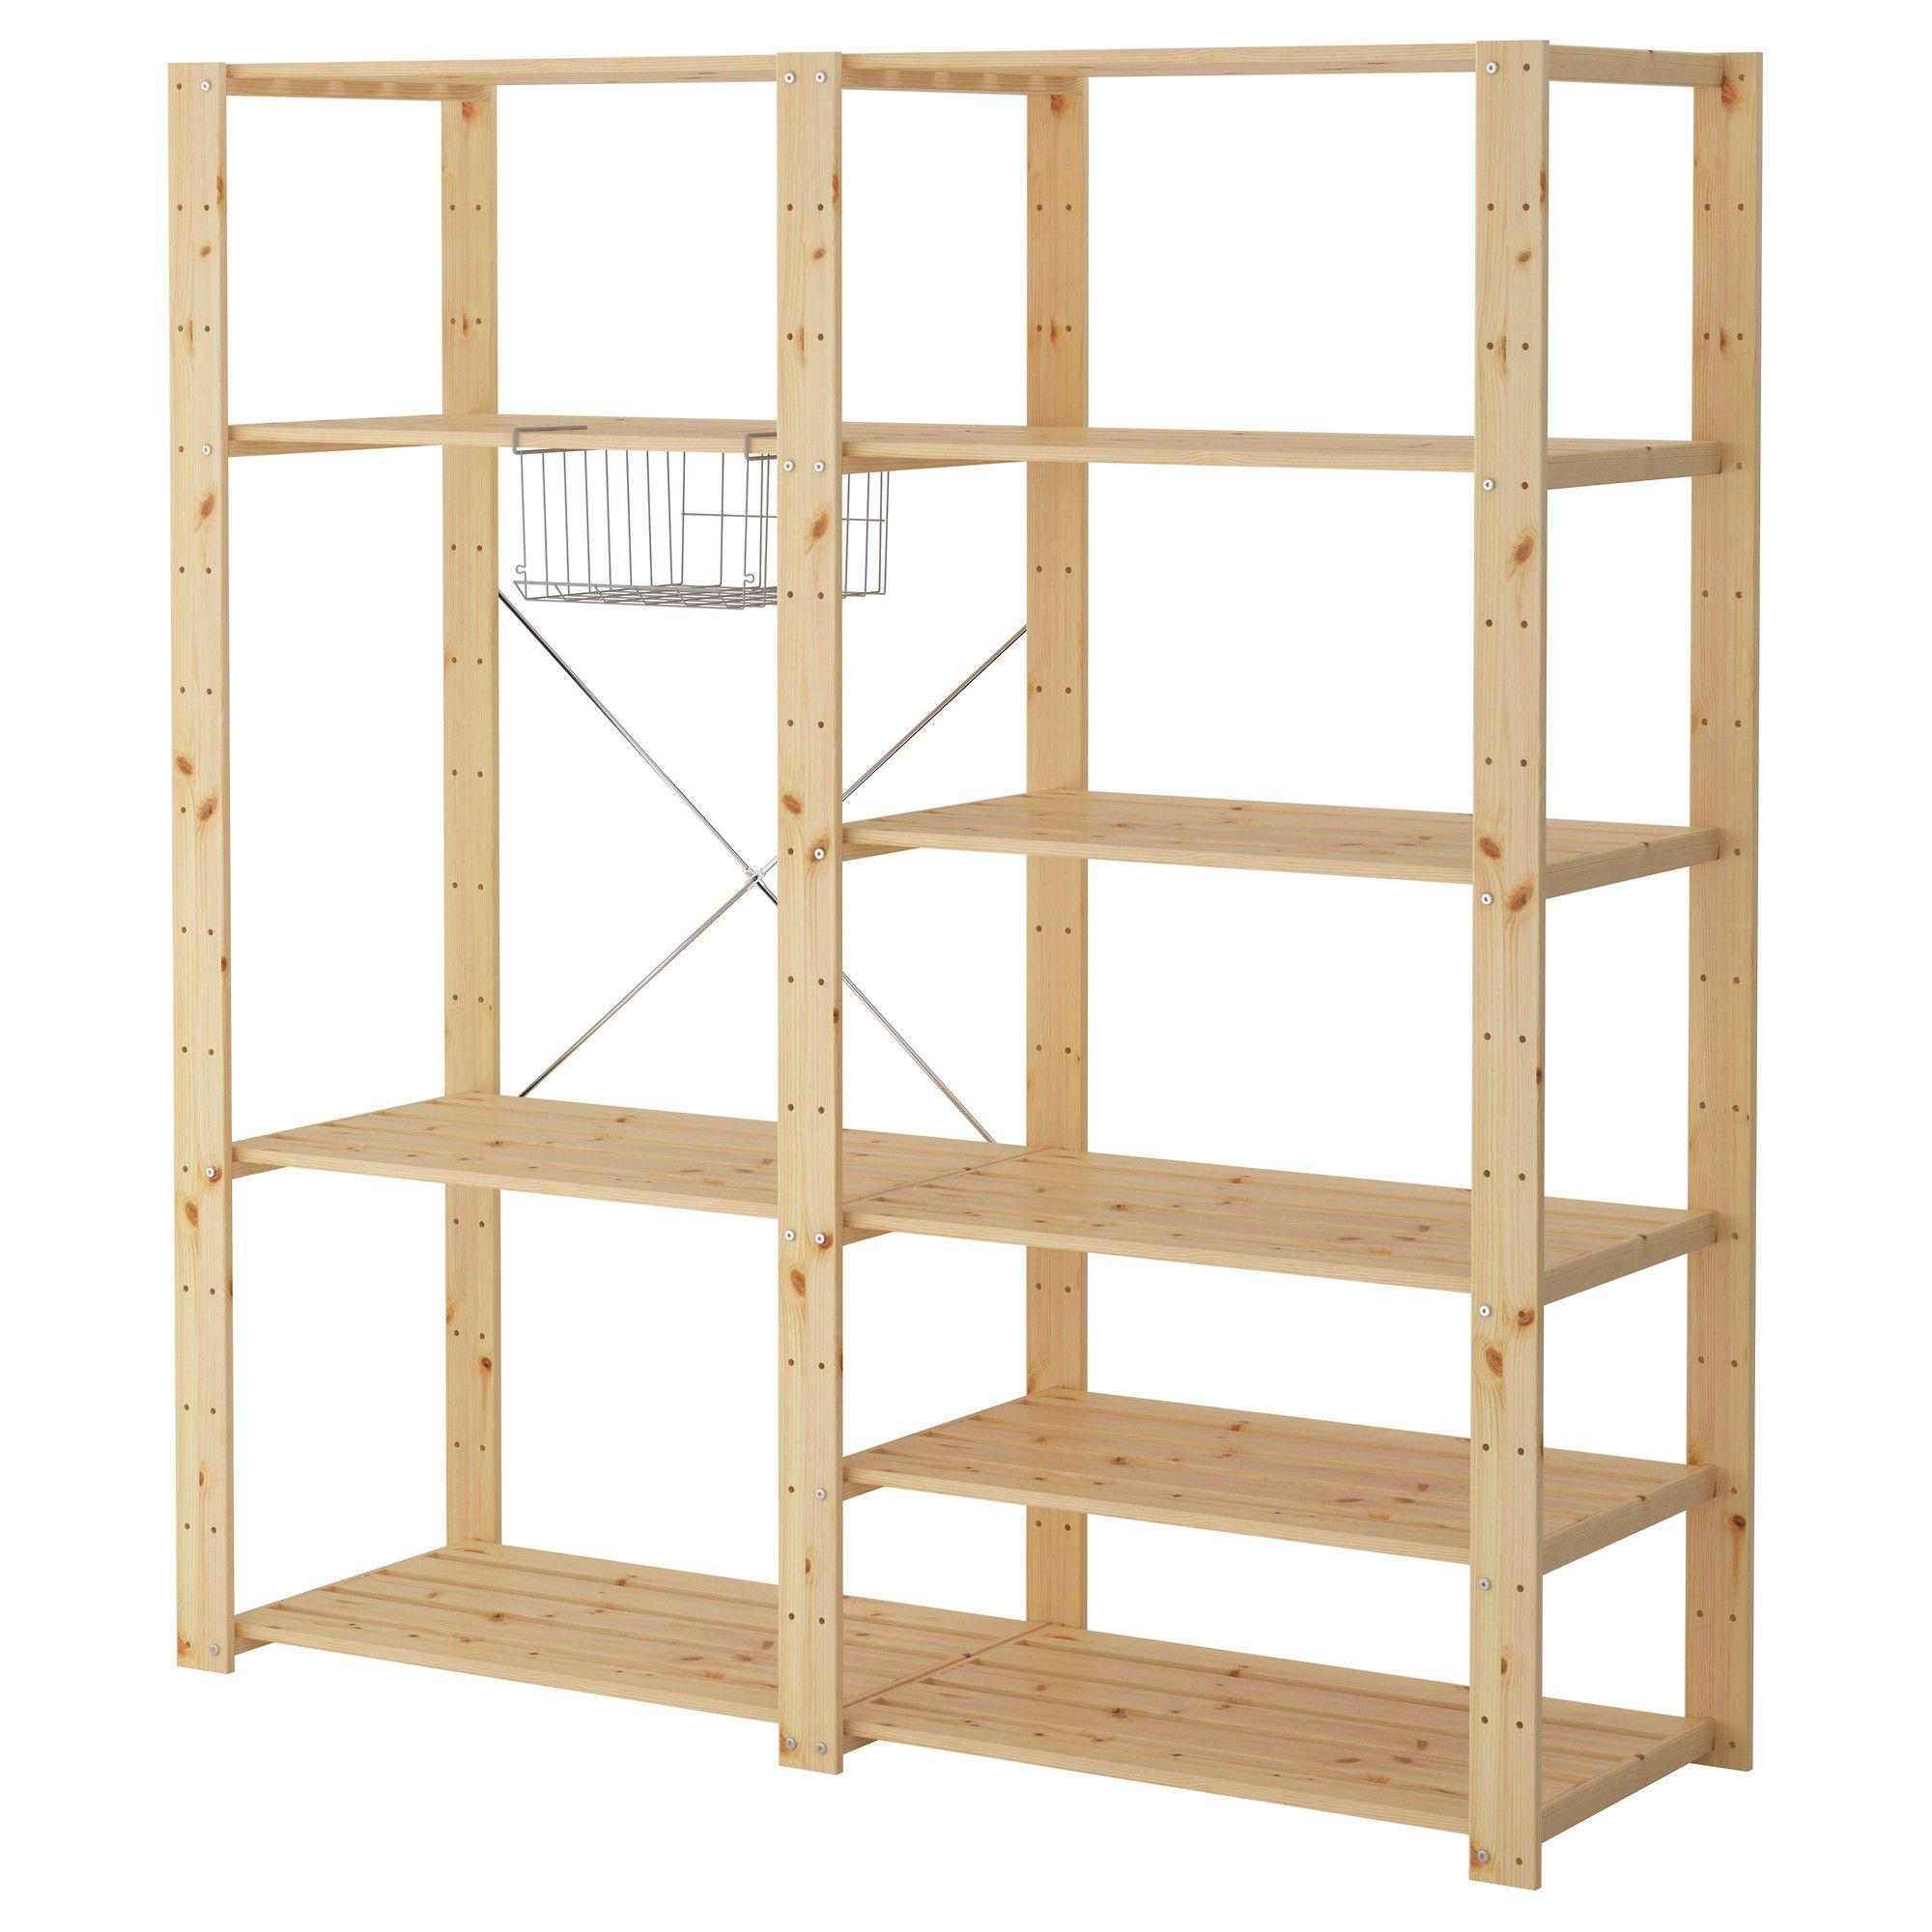 hejne 2 sections - 154x50x171 cm - ikea | pantry | pinterest | ikea